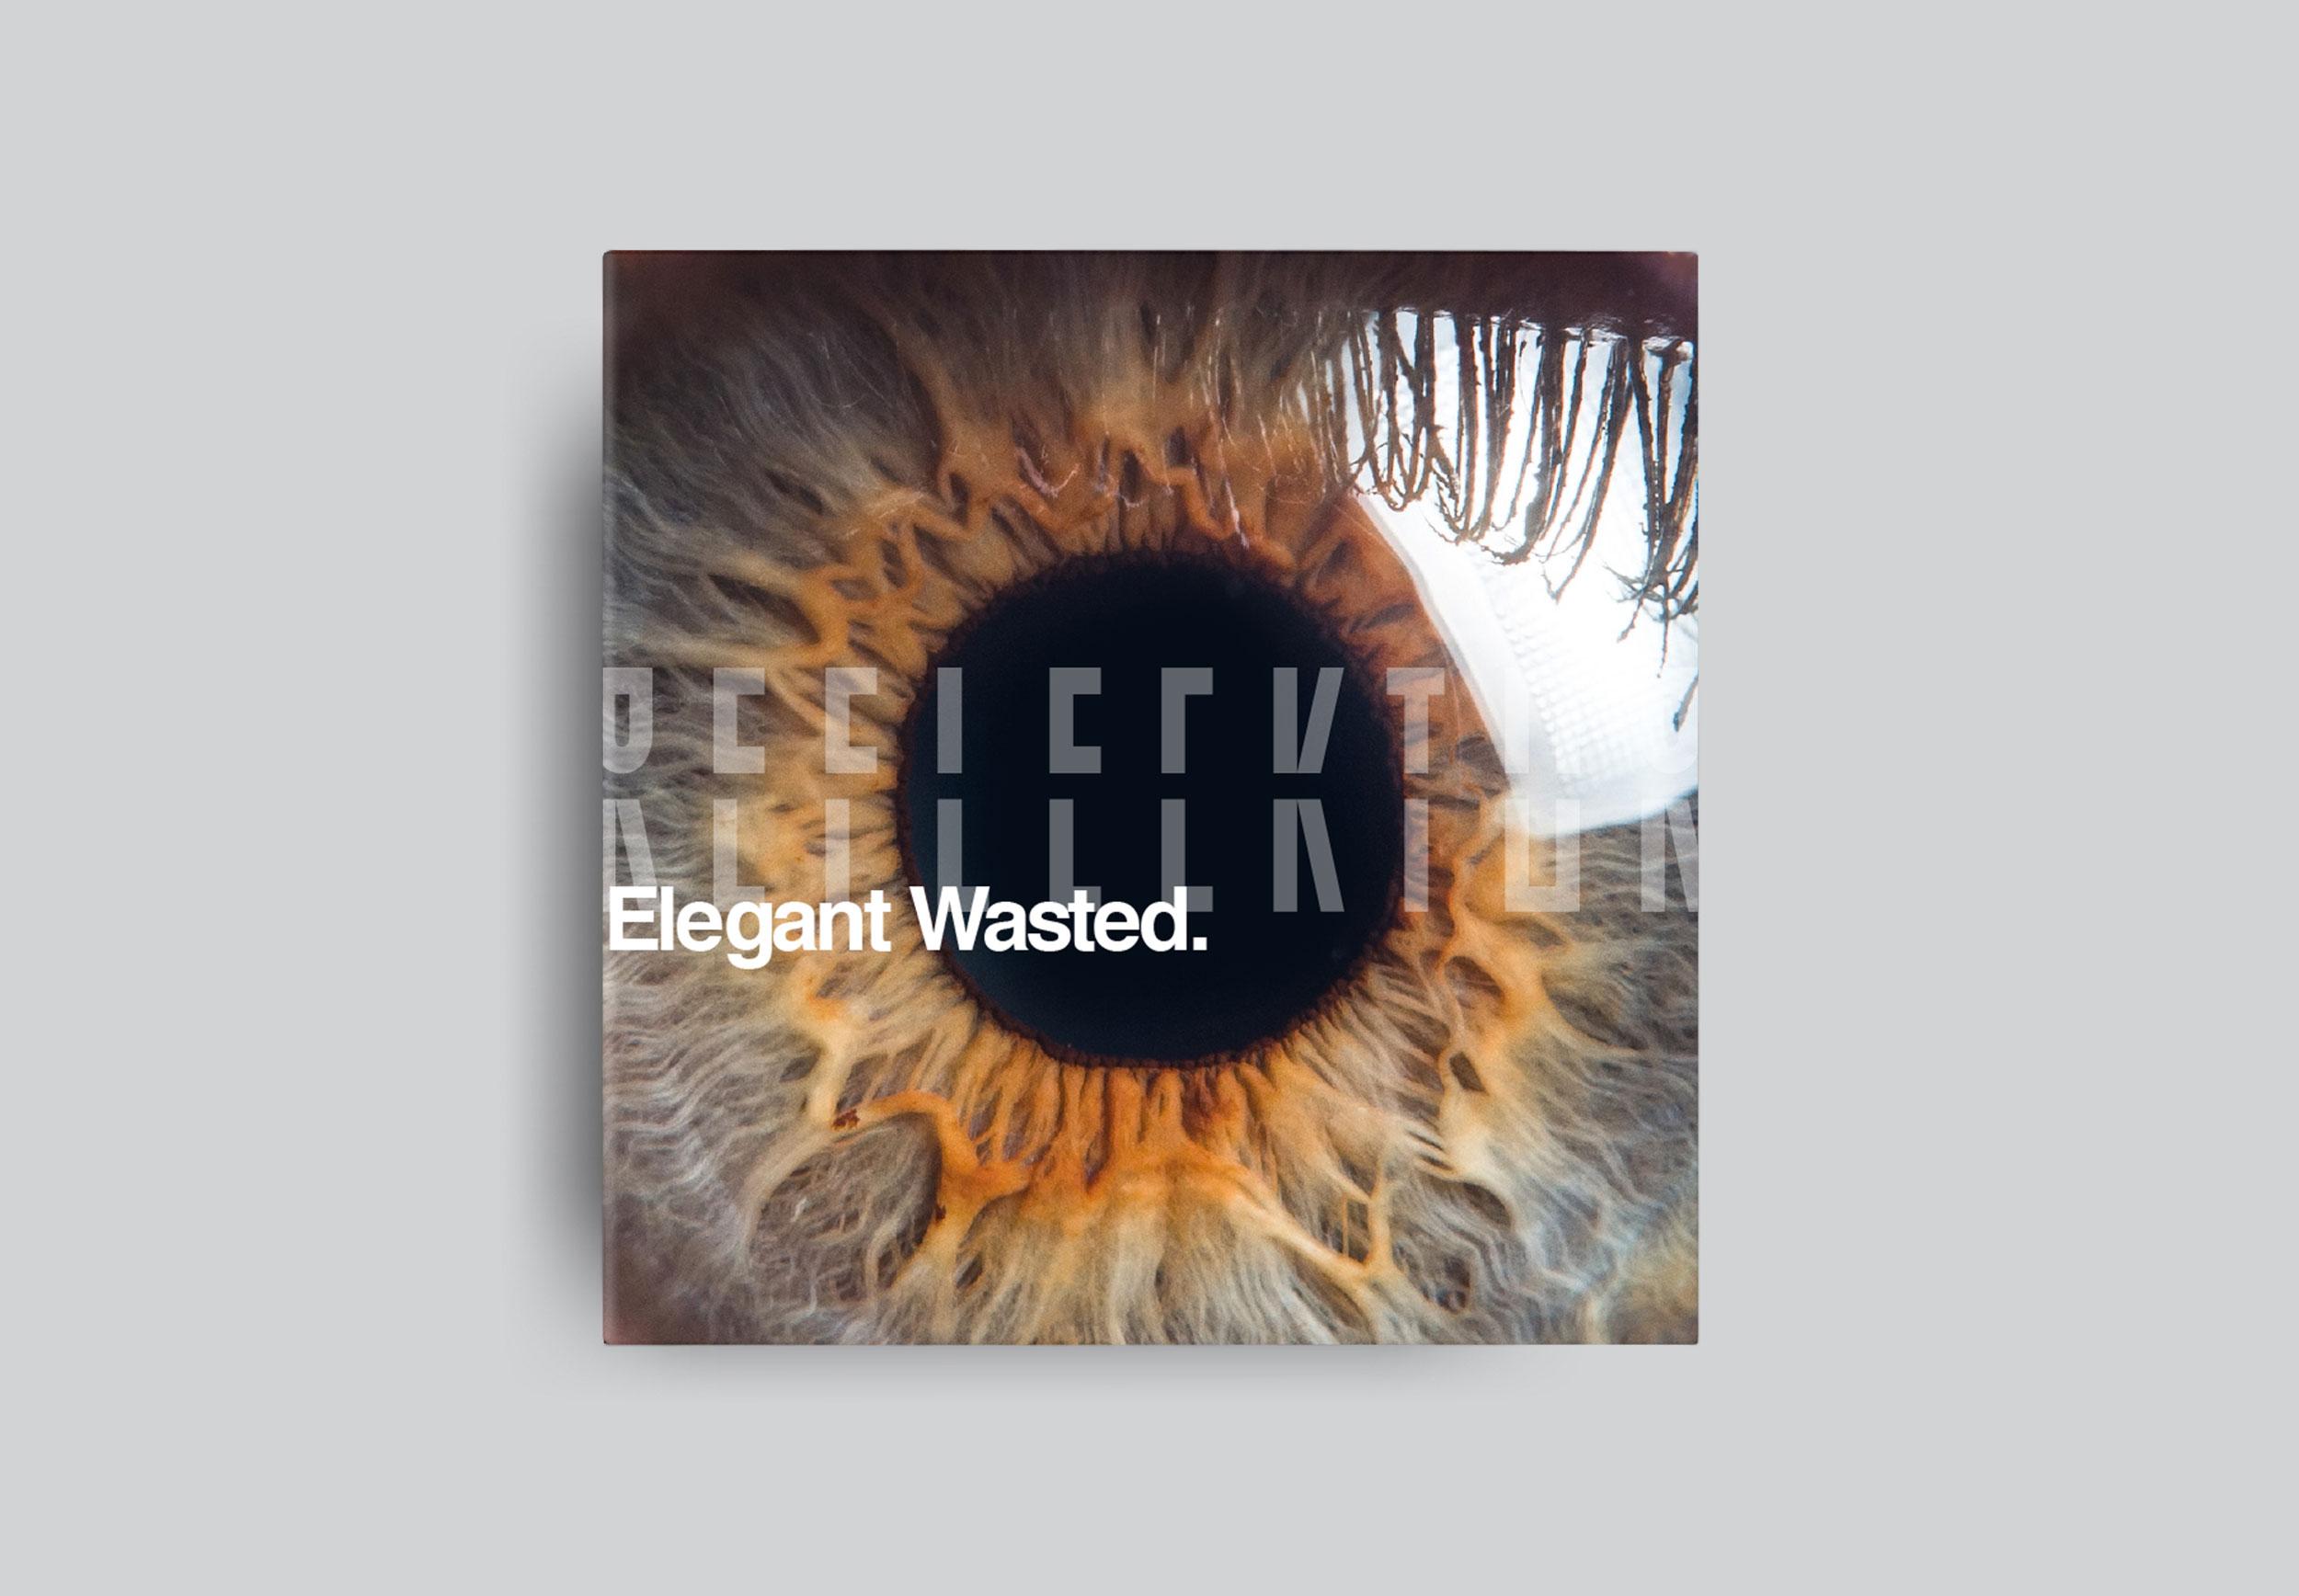 Buy / Play 'Elegant Wasted' here